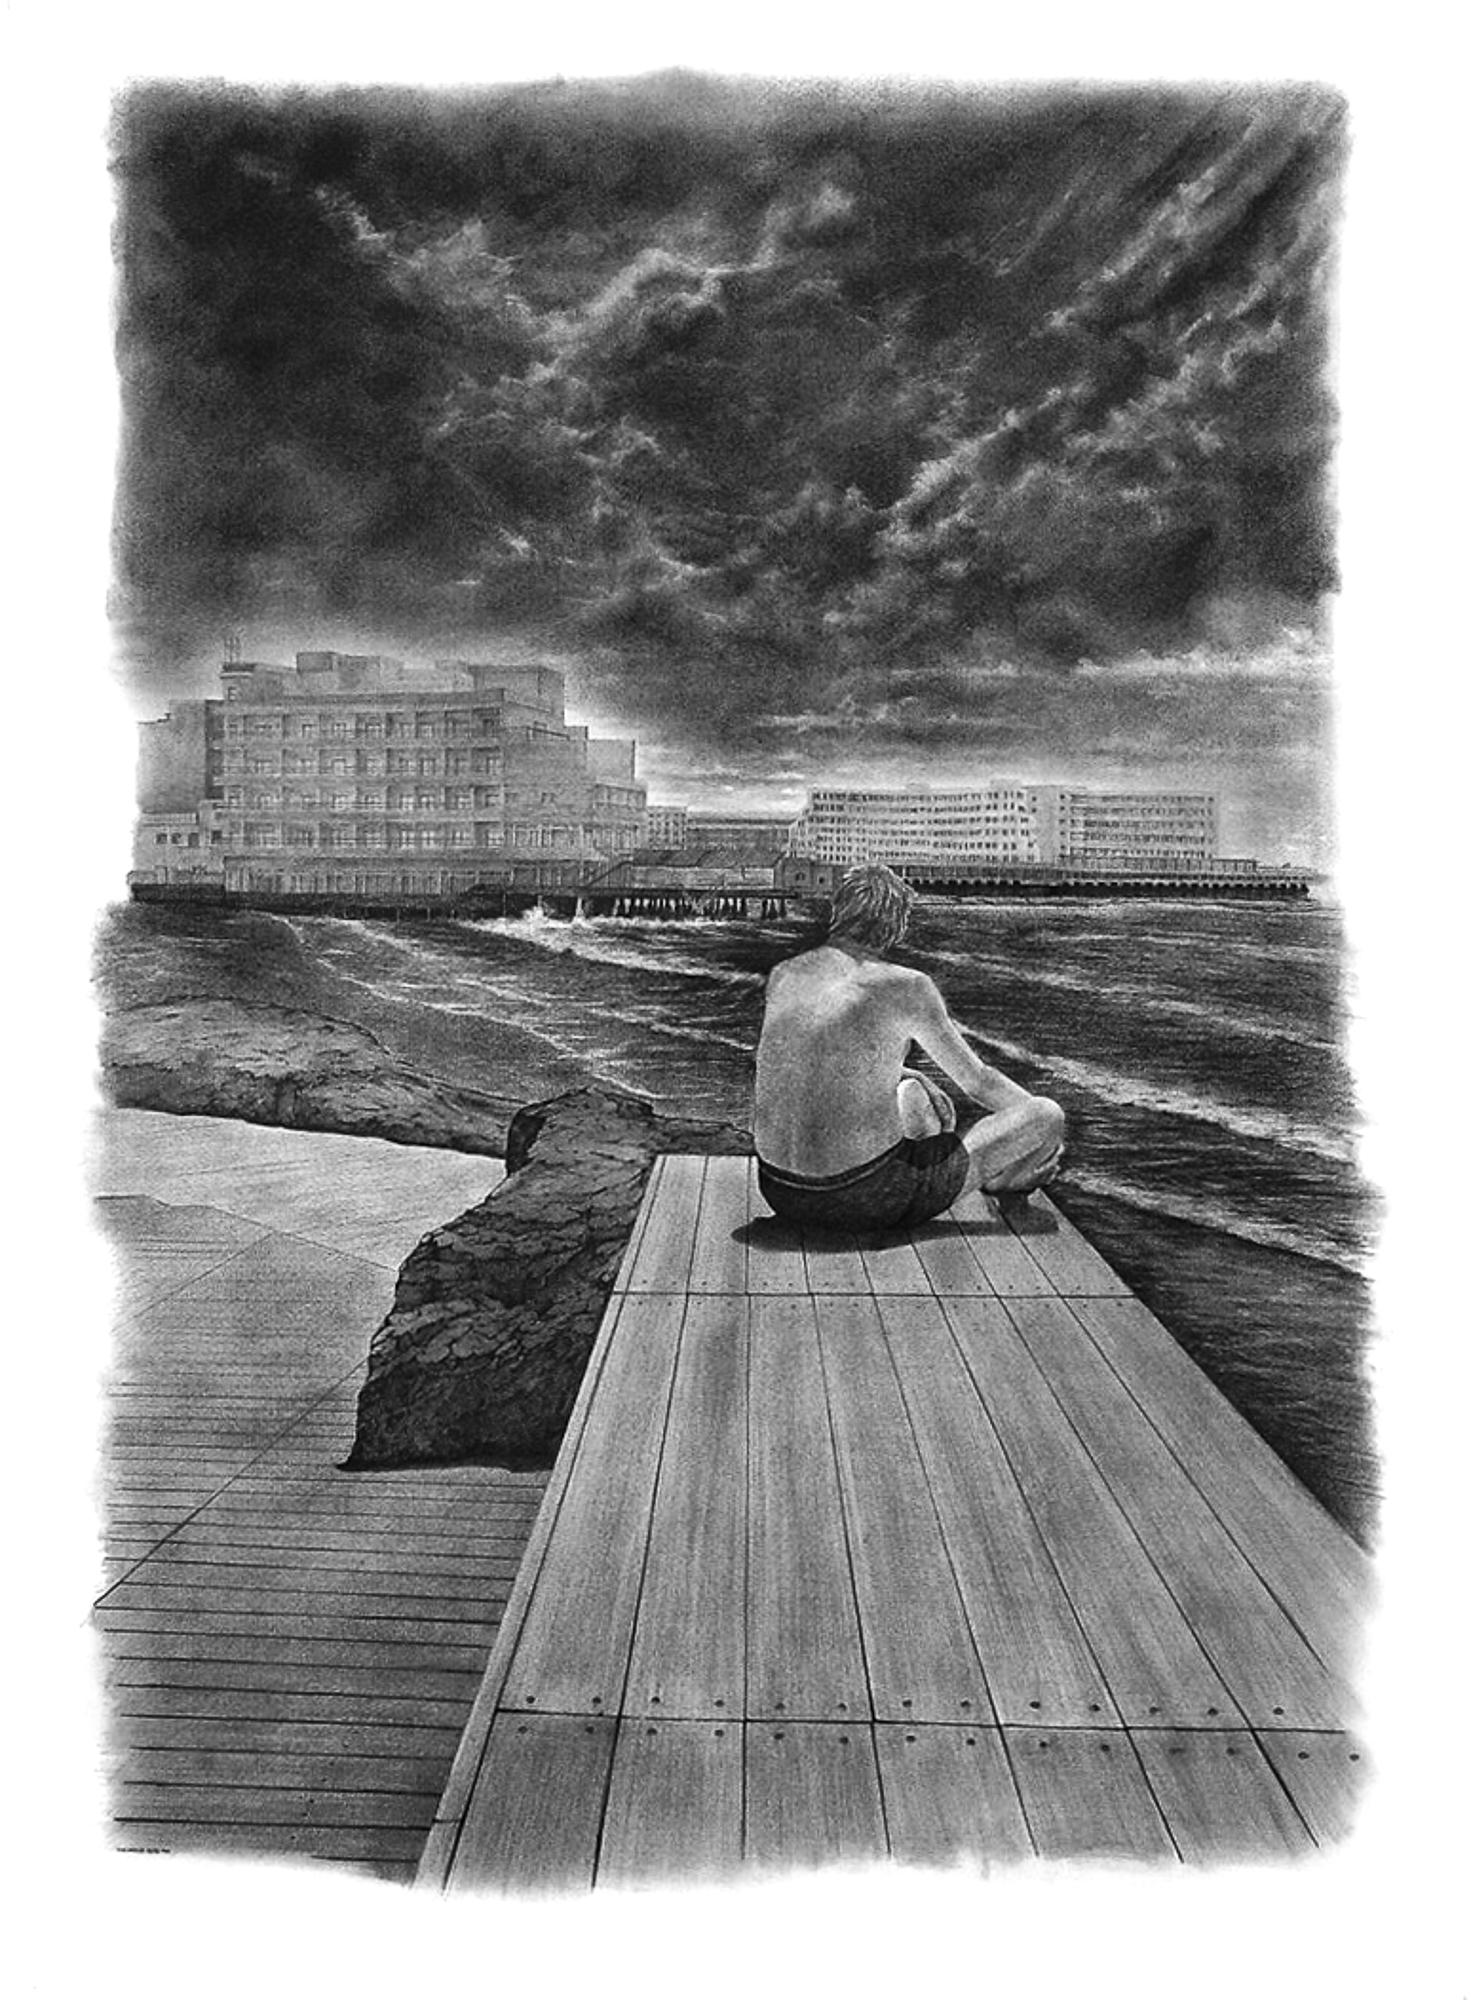 Magnolia Soto. Apuntes sobre identidad I. 1999. Grafito sobre papel. 100 x 75 cm.